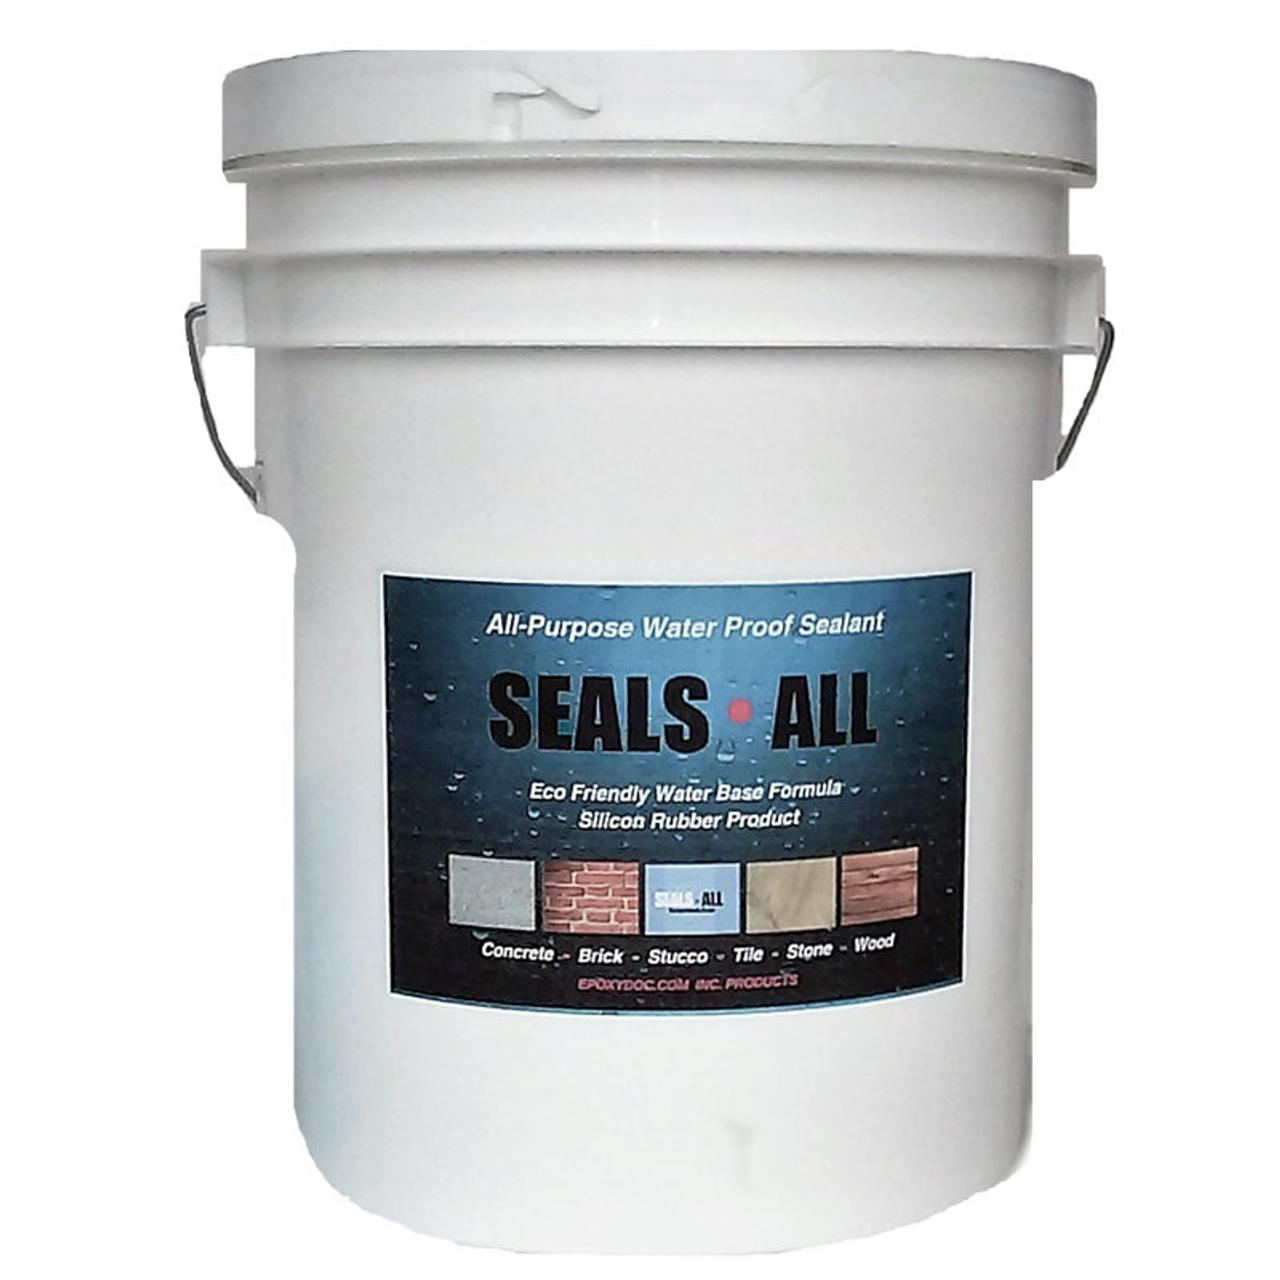 Epoxydoc seals all concrete sealer.  Waterproof concrete, brick, stone, wood, and canvas.